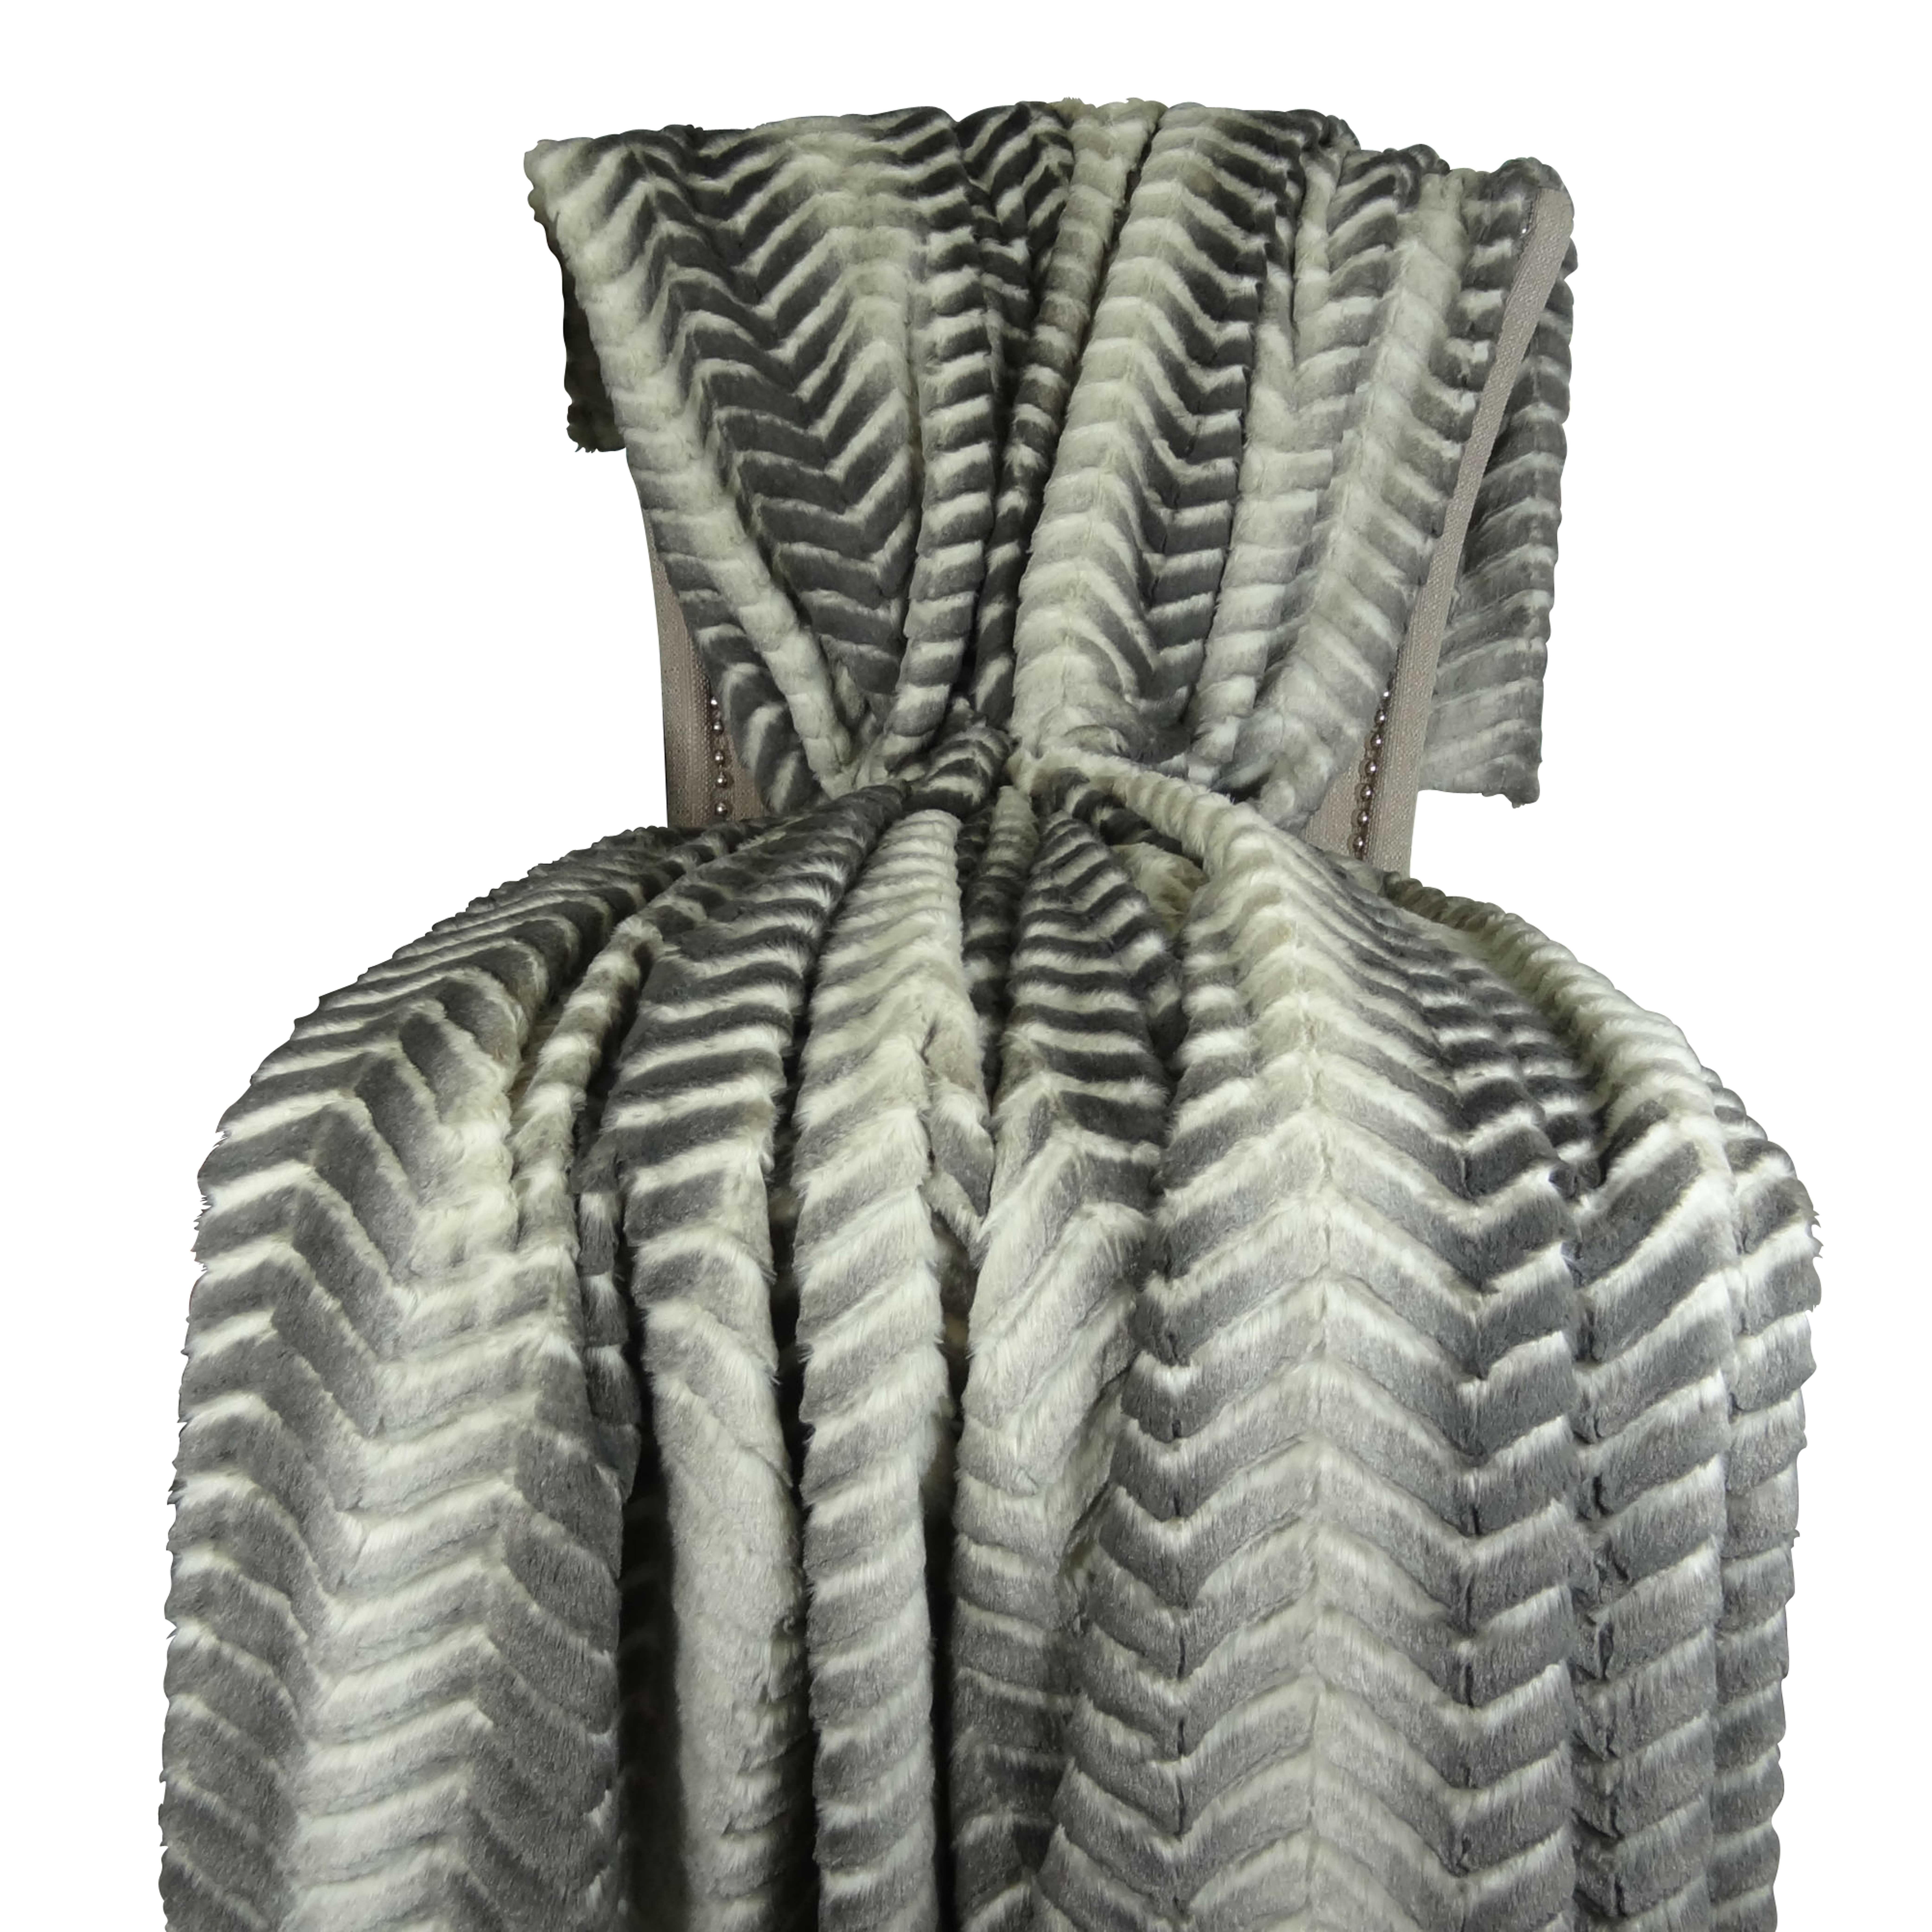 Plutus Cuddle Mirage Handmade Throw / Blanket